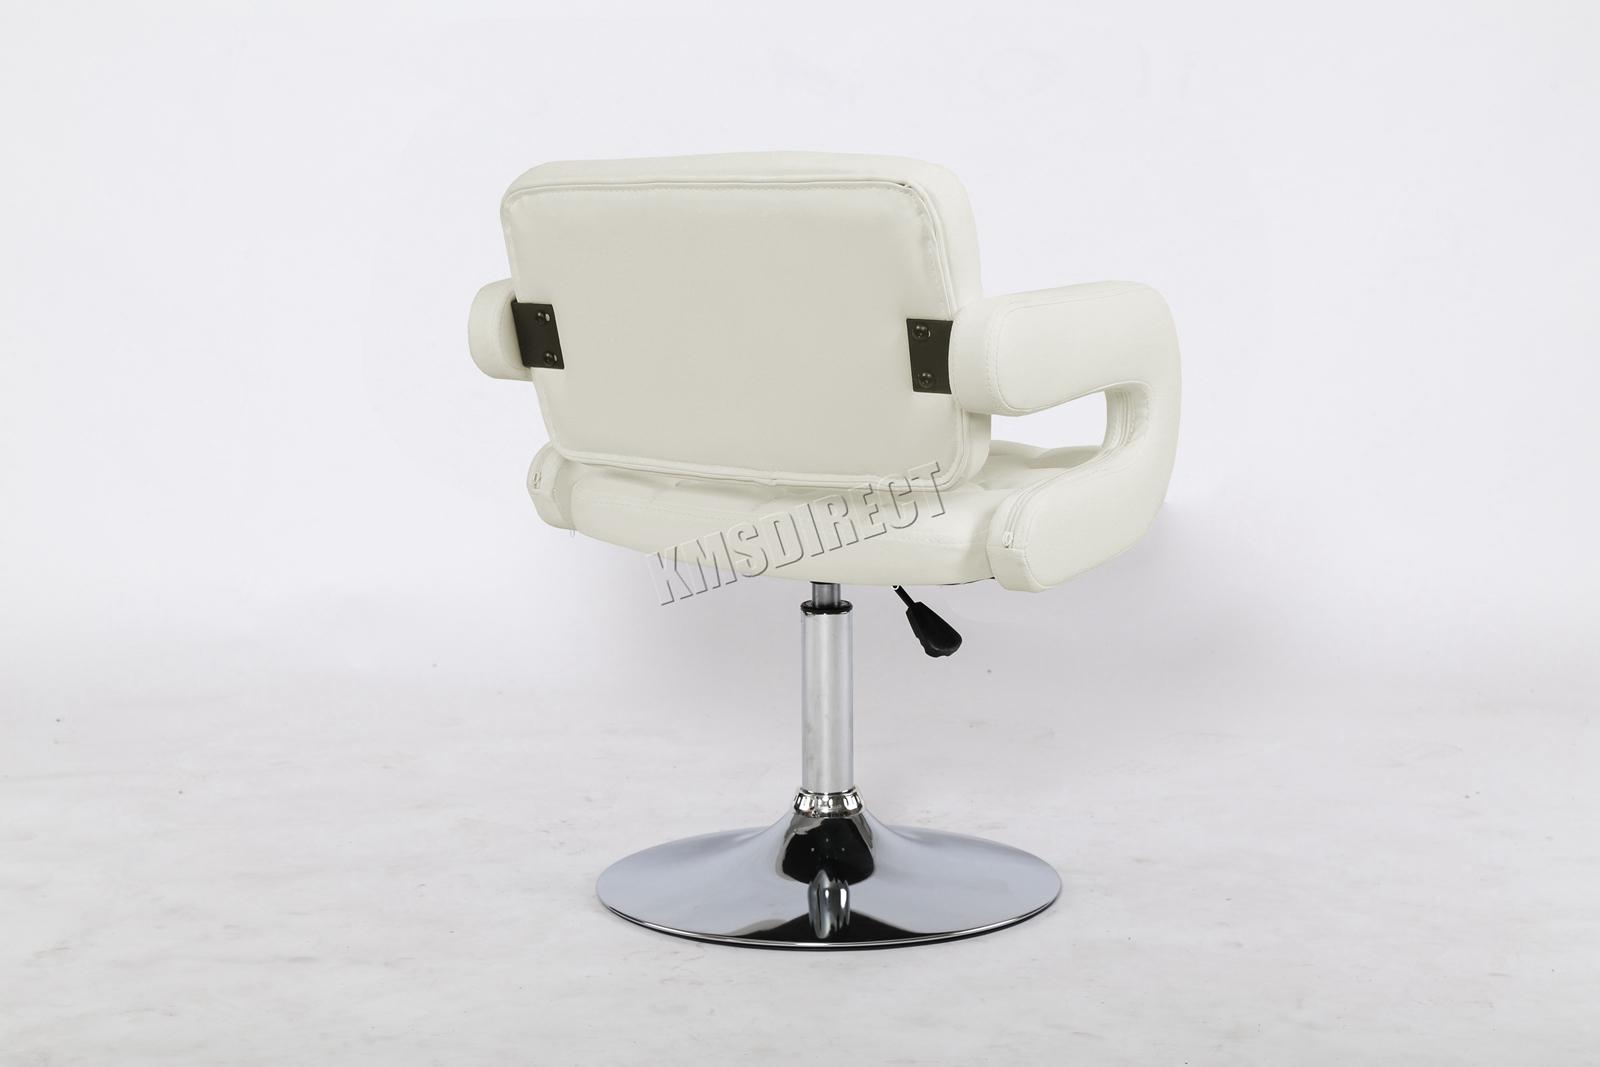 WestWood-Beauty-Salon-Chair-Barber-Hairdressing-Hair-Cut-PU-Leather-Modern-SC02 miniatuur 26